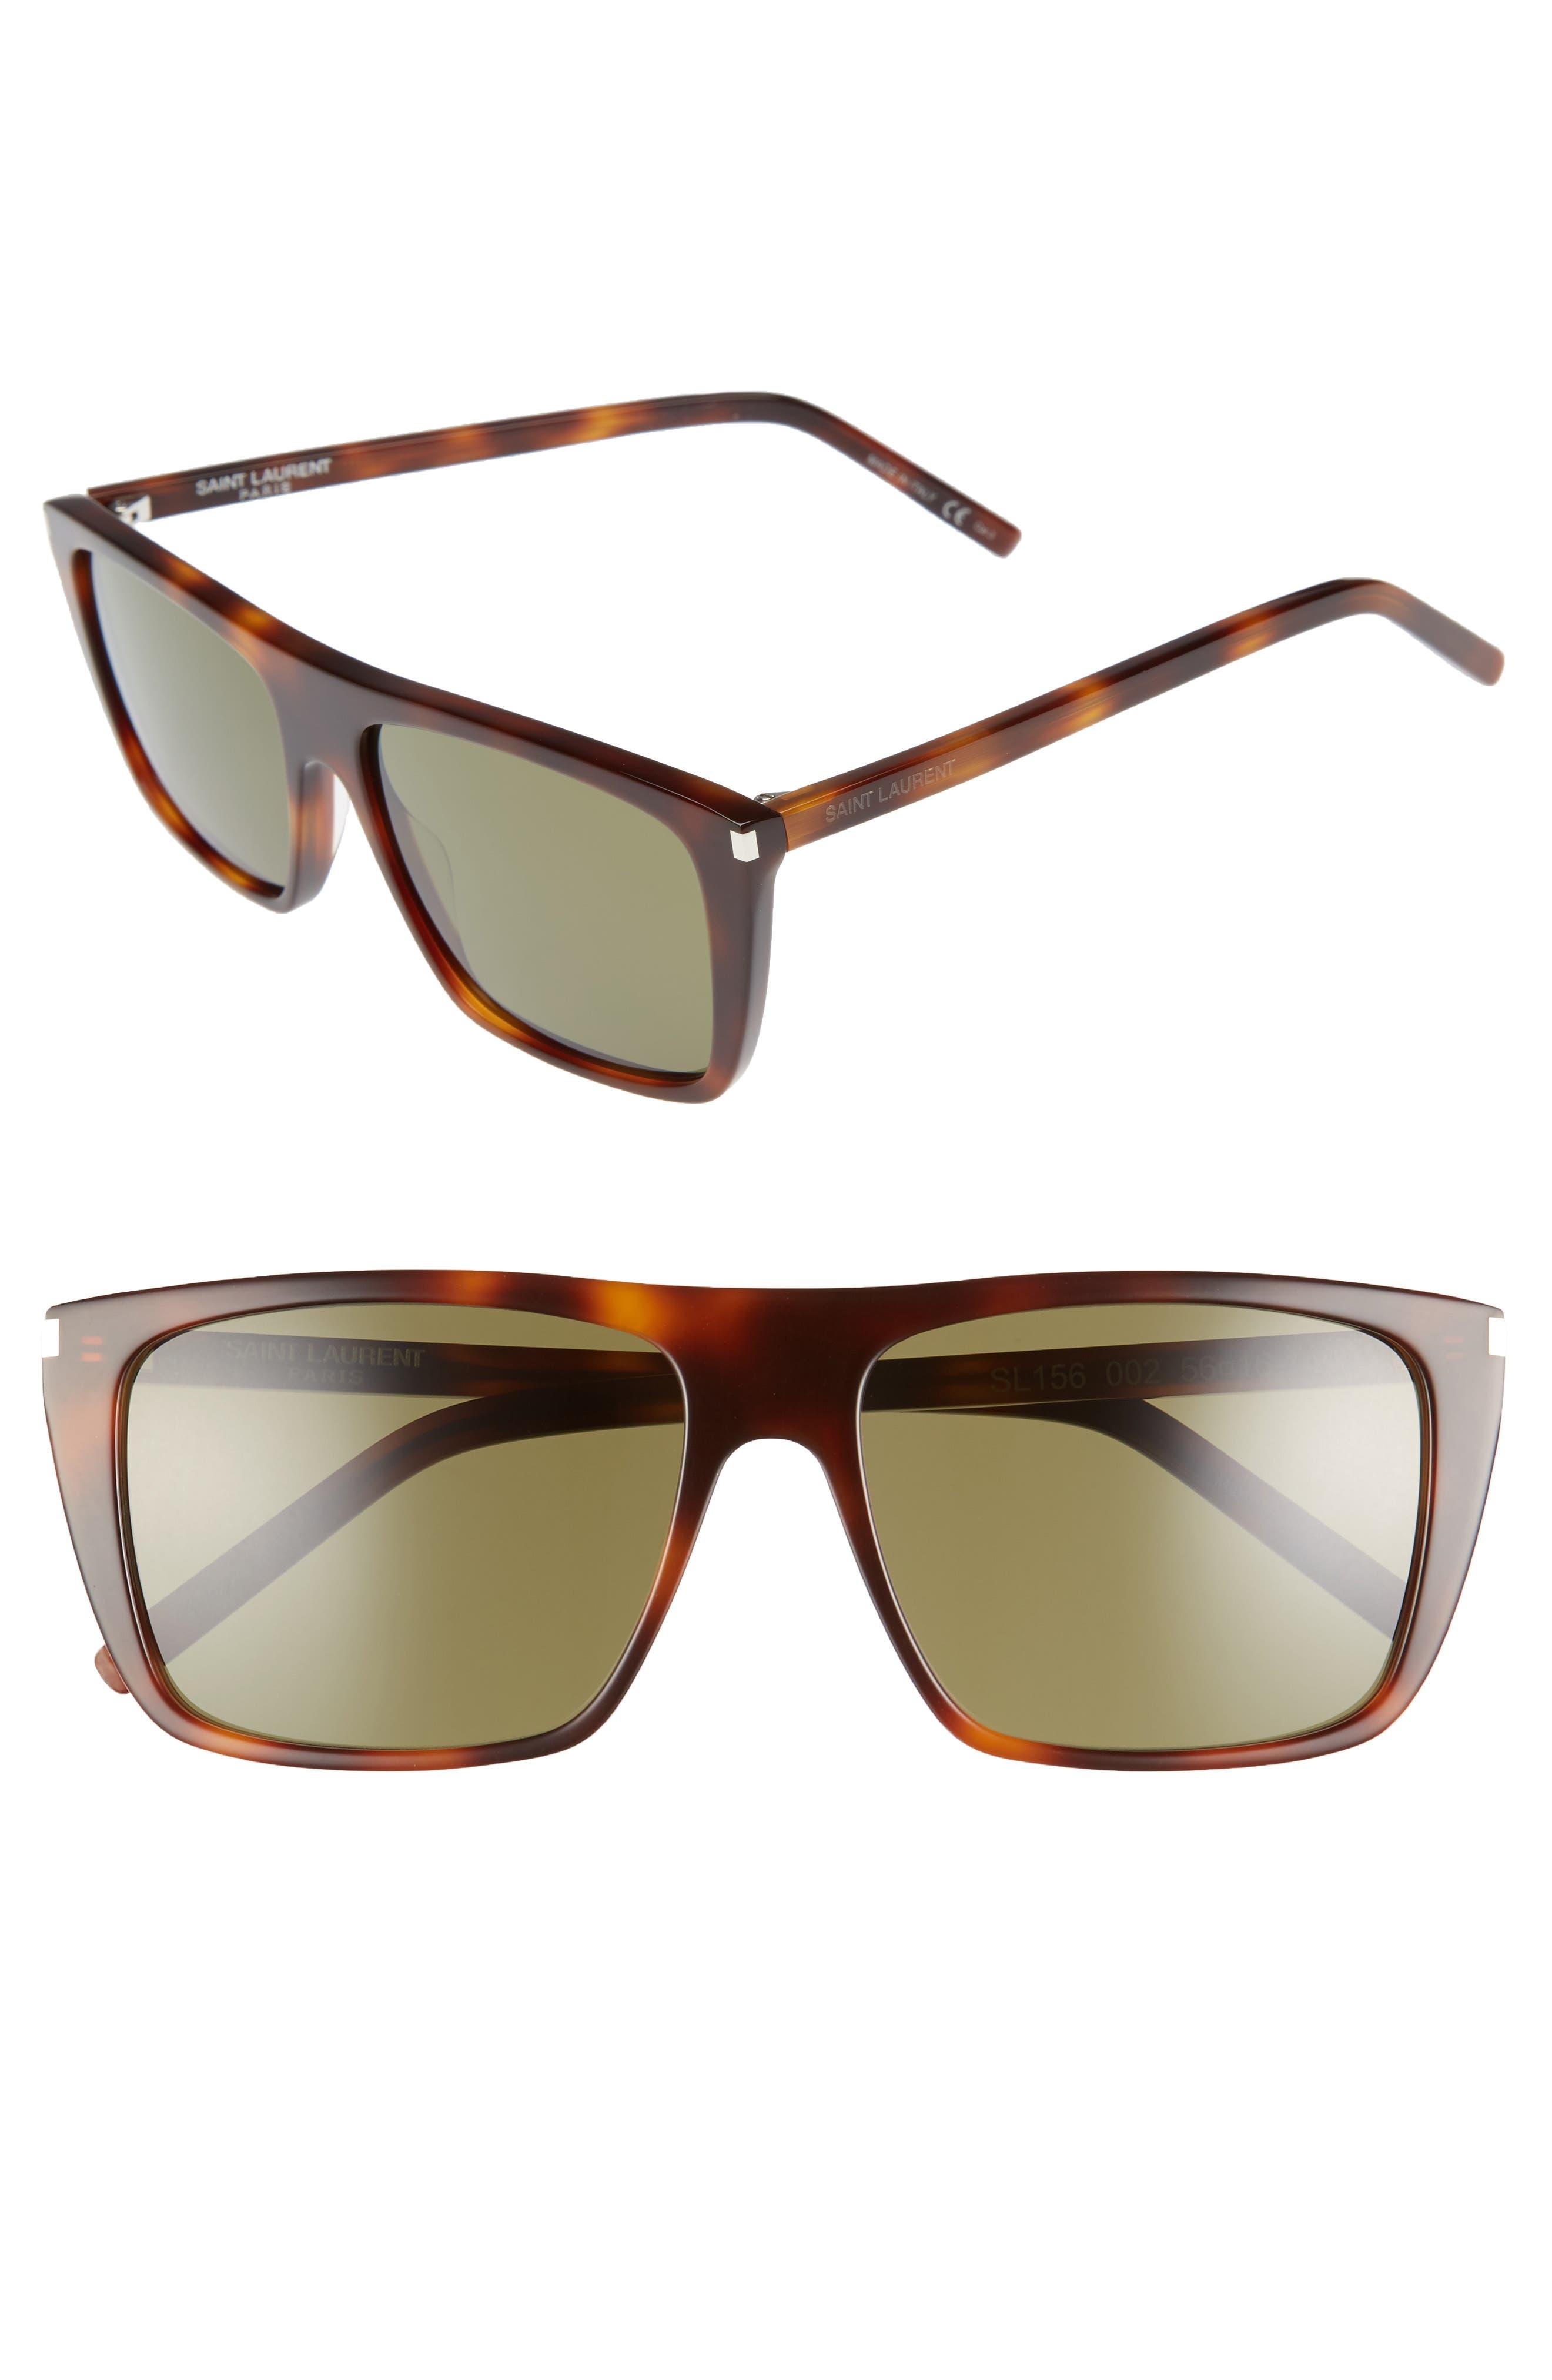 Avana 56mm Flat Top Sunglasses,                             Main thumbnail 1, color,                             Havana